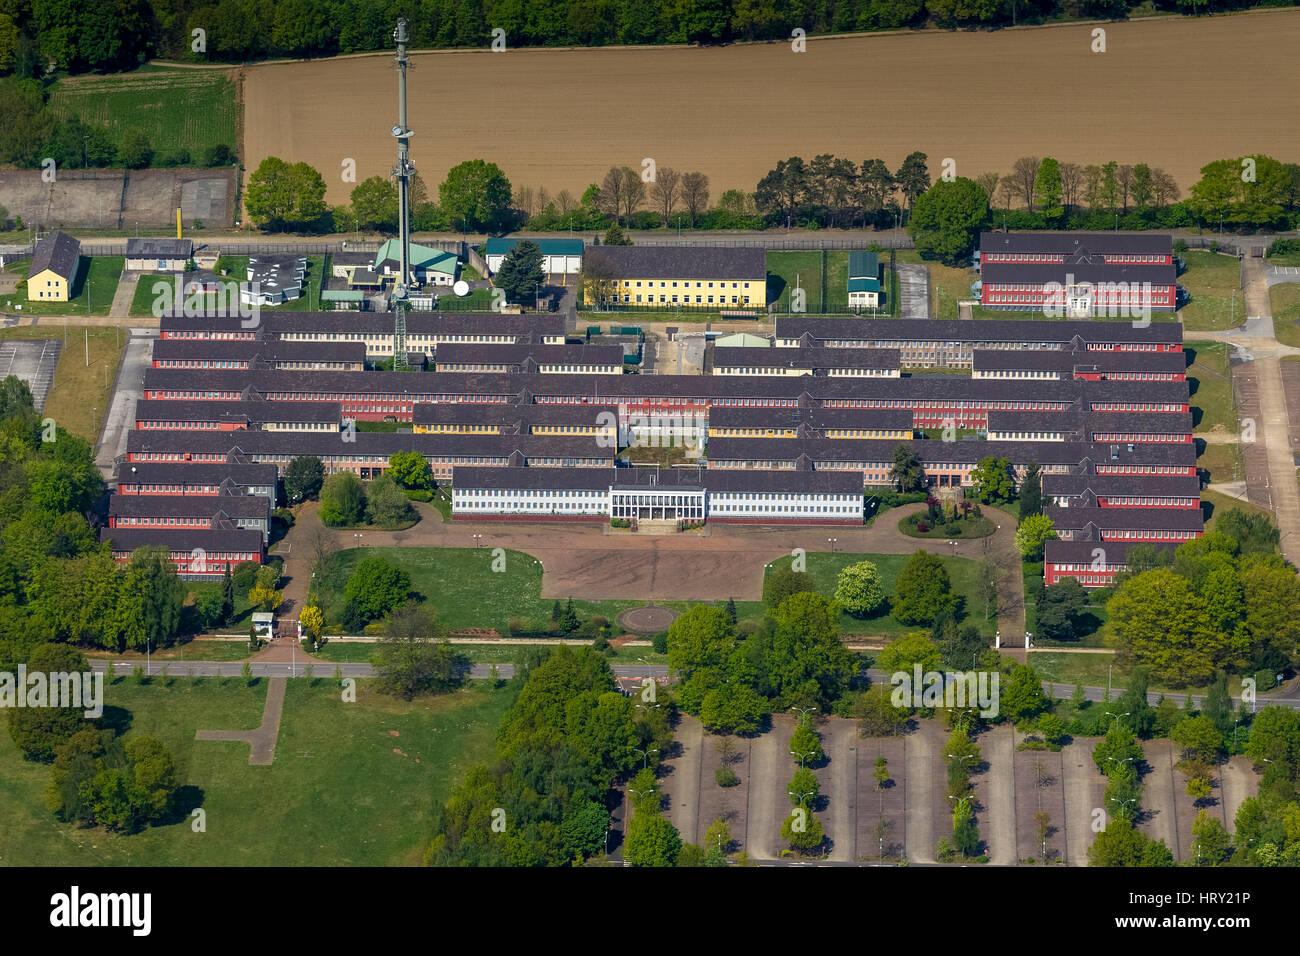 Conversion, former military headquarters of the British Army Army, JHQ Rheindahlen, Mönchengladbach, Lower - Stock Image